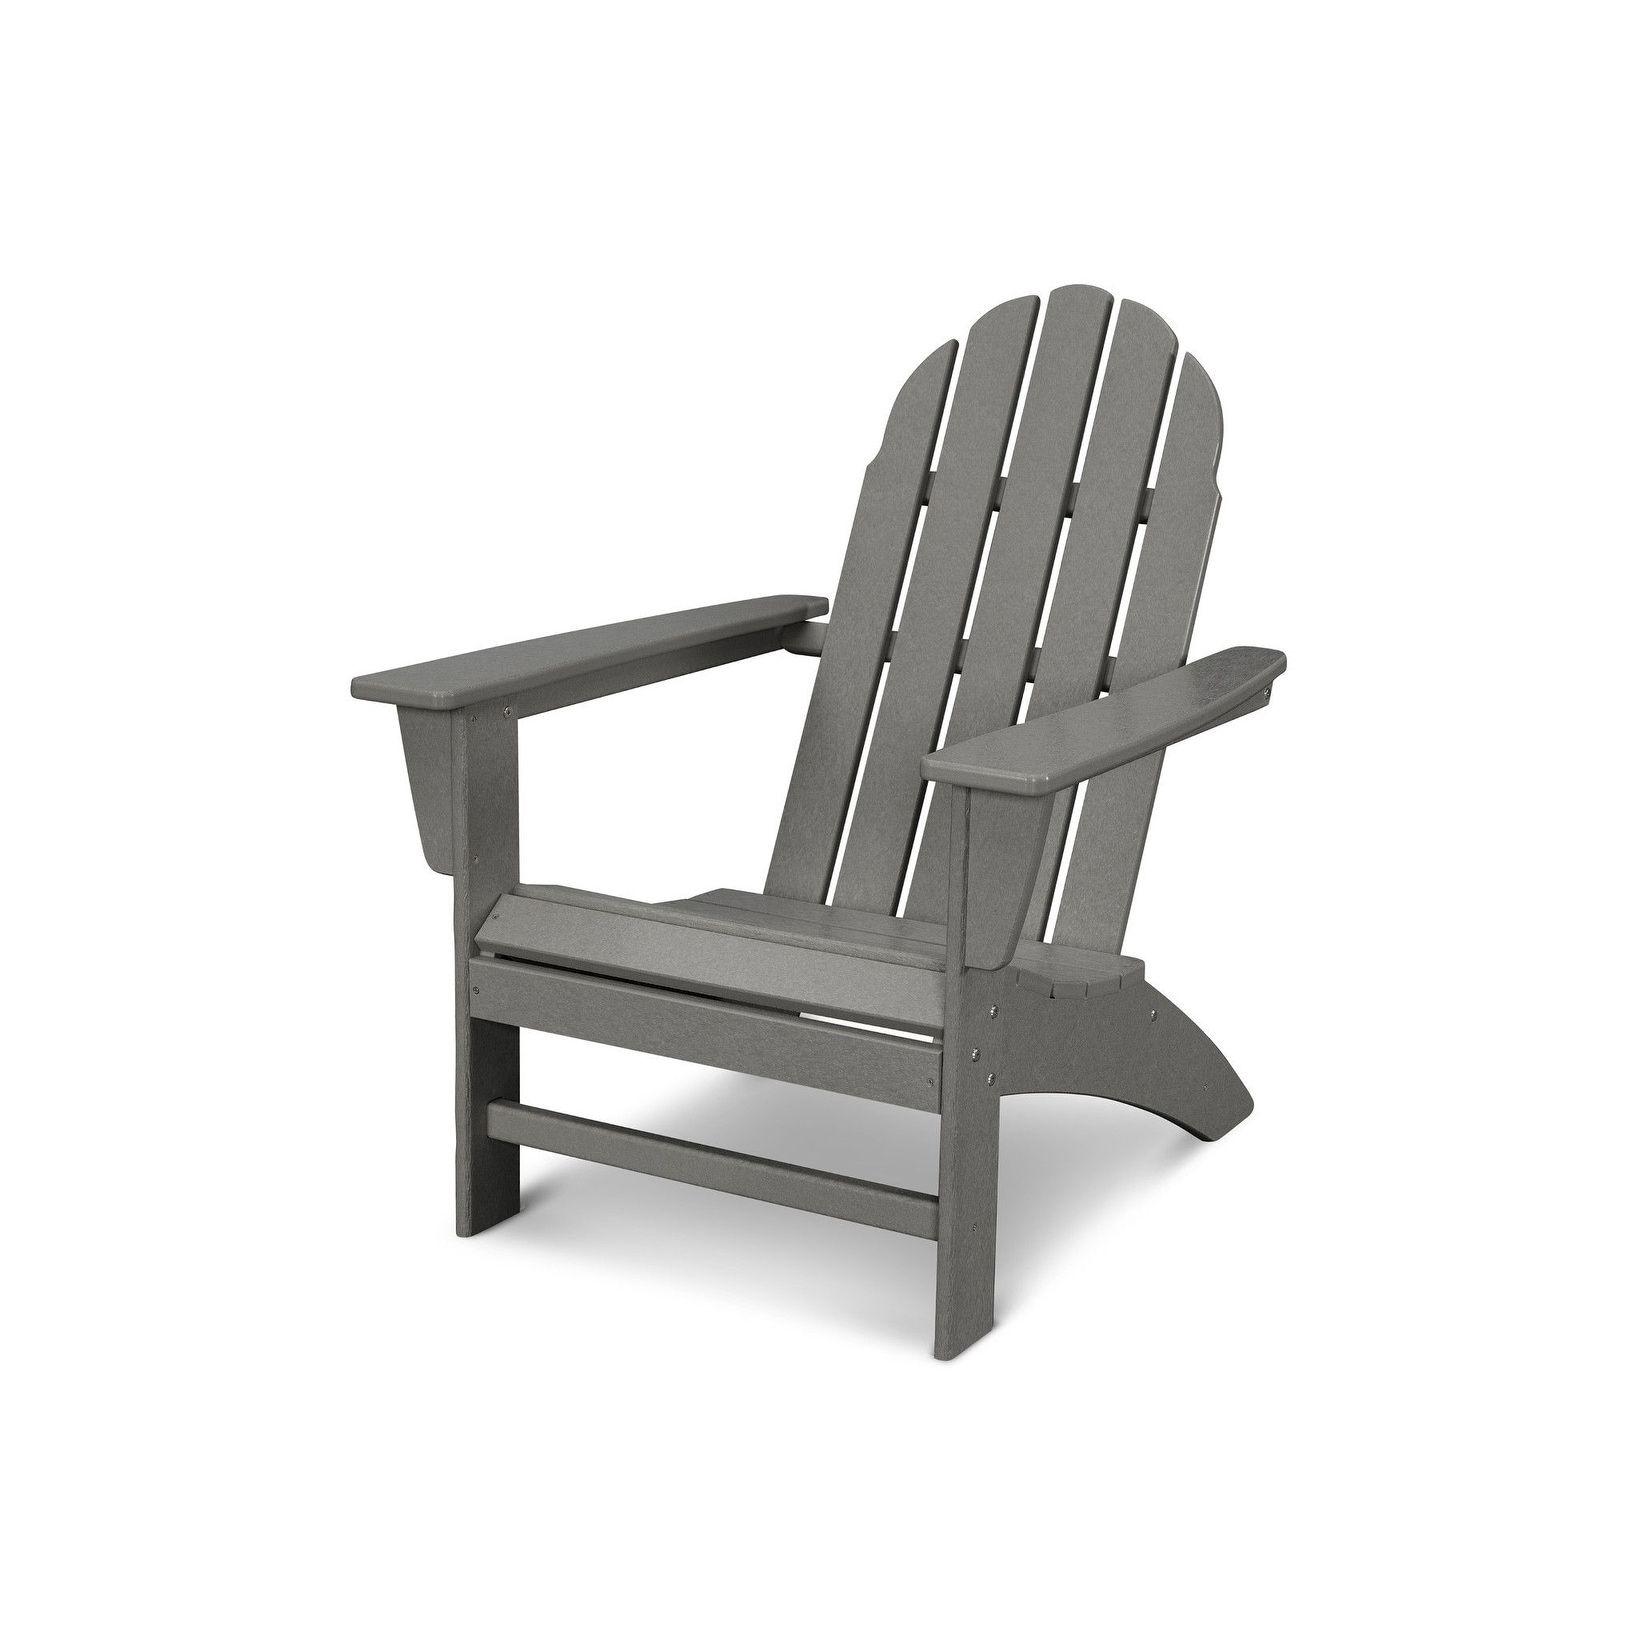 Polywood Vineyard Outdoor Adirondack Chair Outdoor Furniture